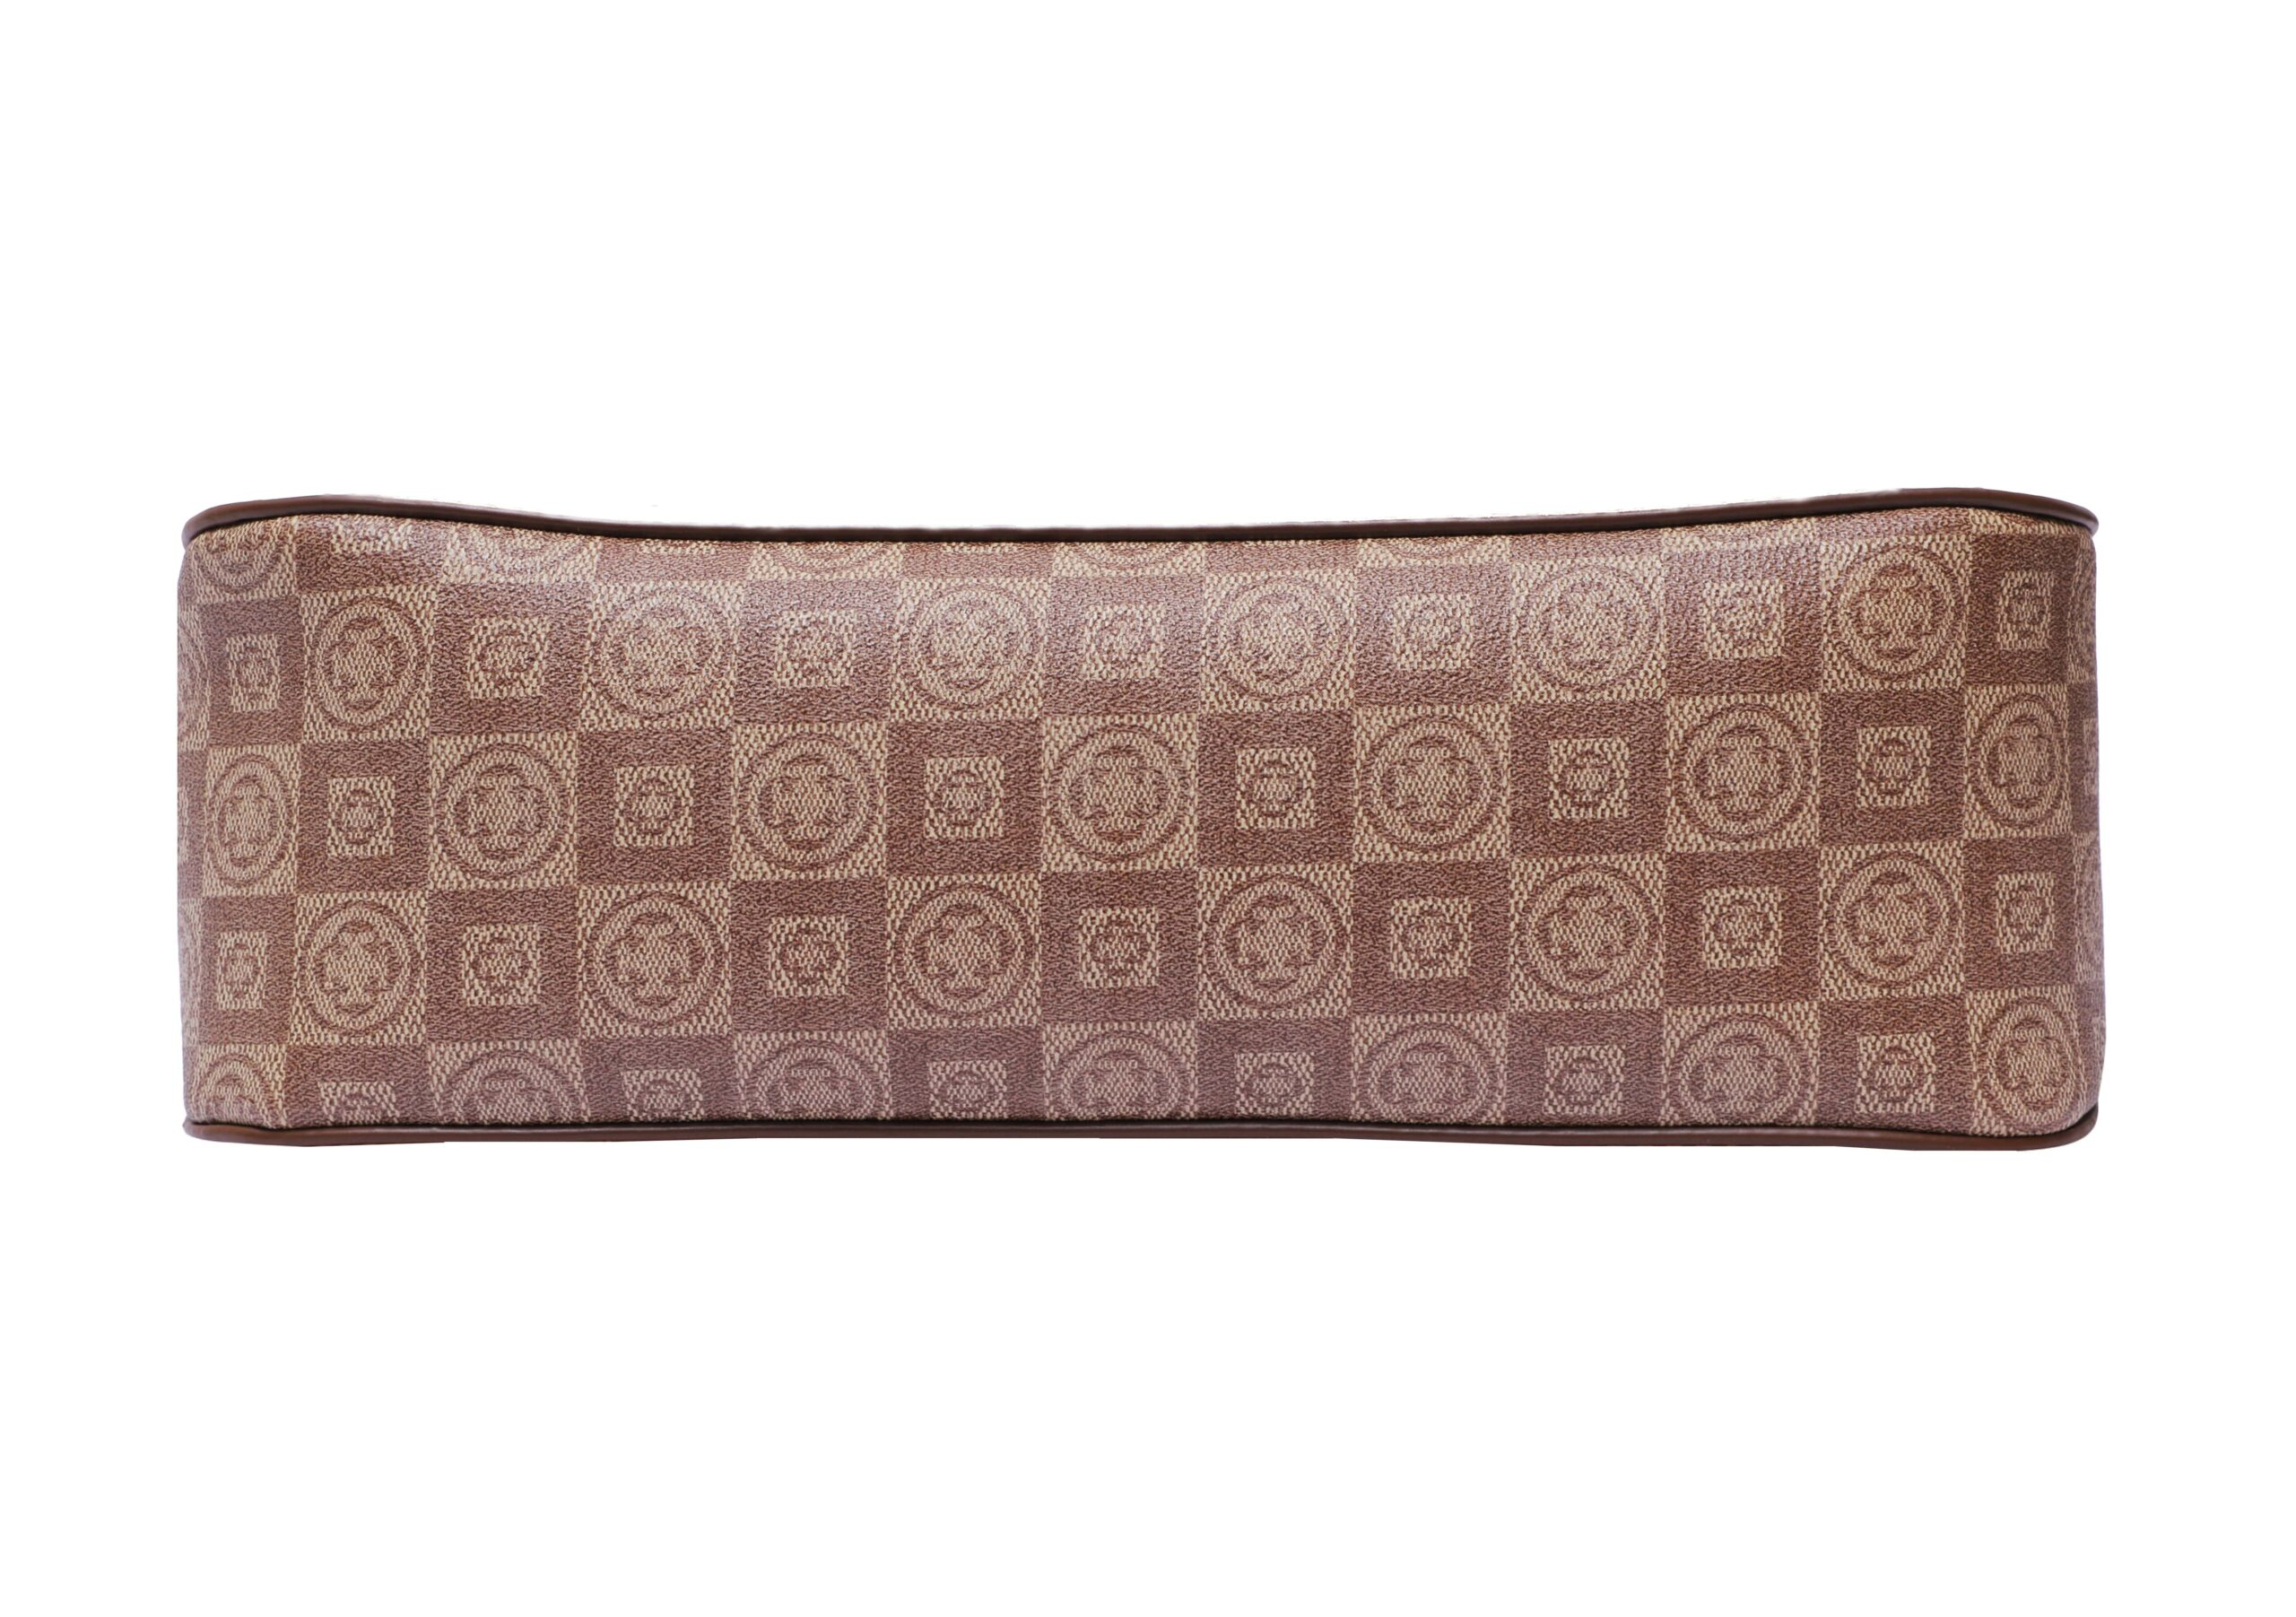 Simbolico quadros brown crossbody